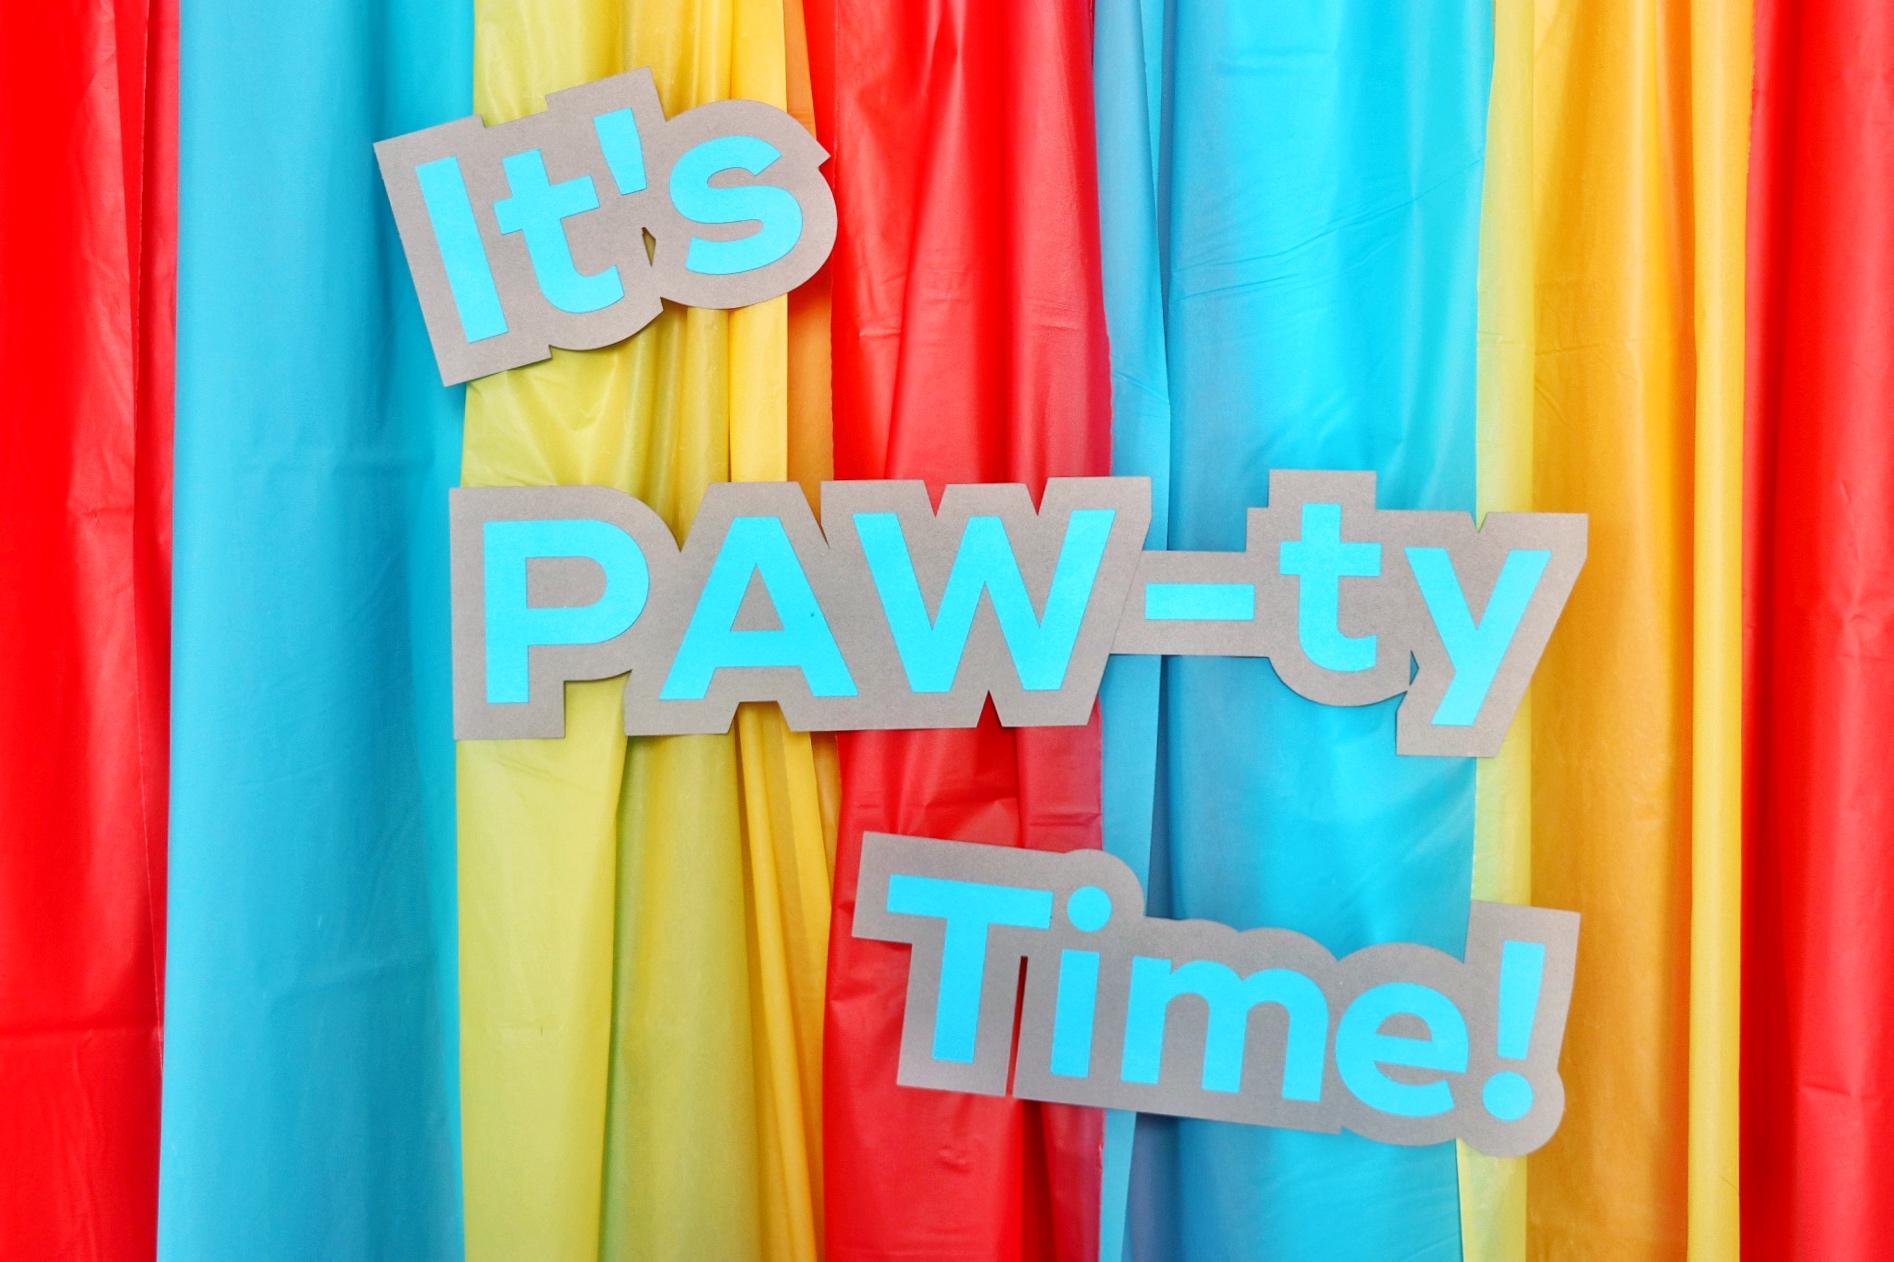 PAW Patrol birthday party ideas: PAW Patrol backdrop